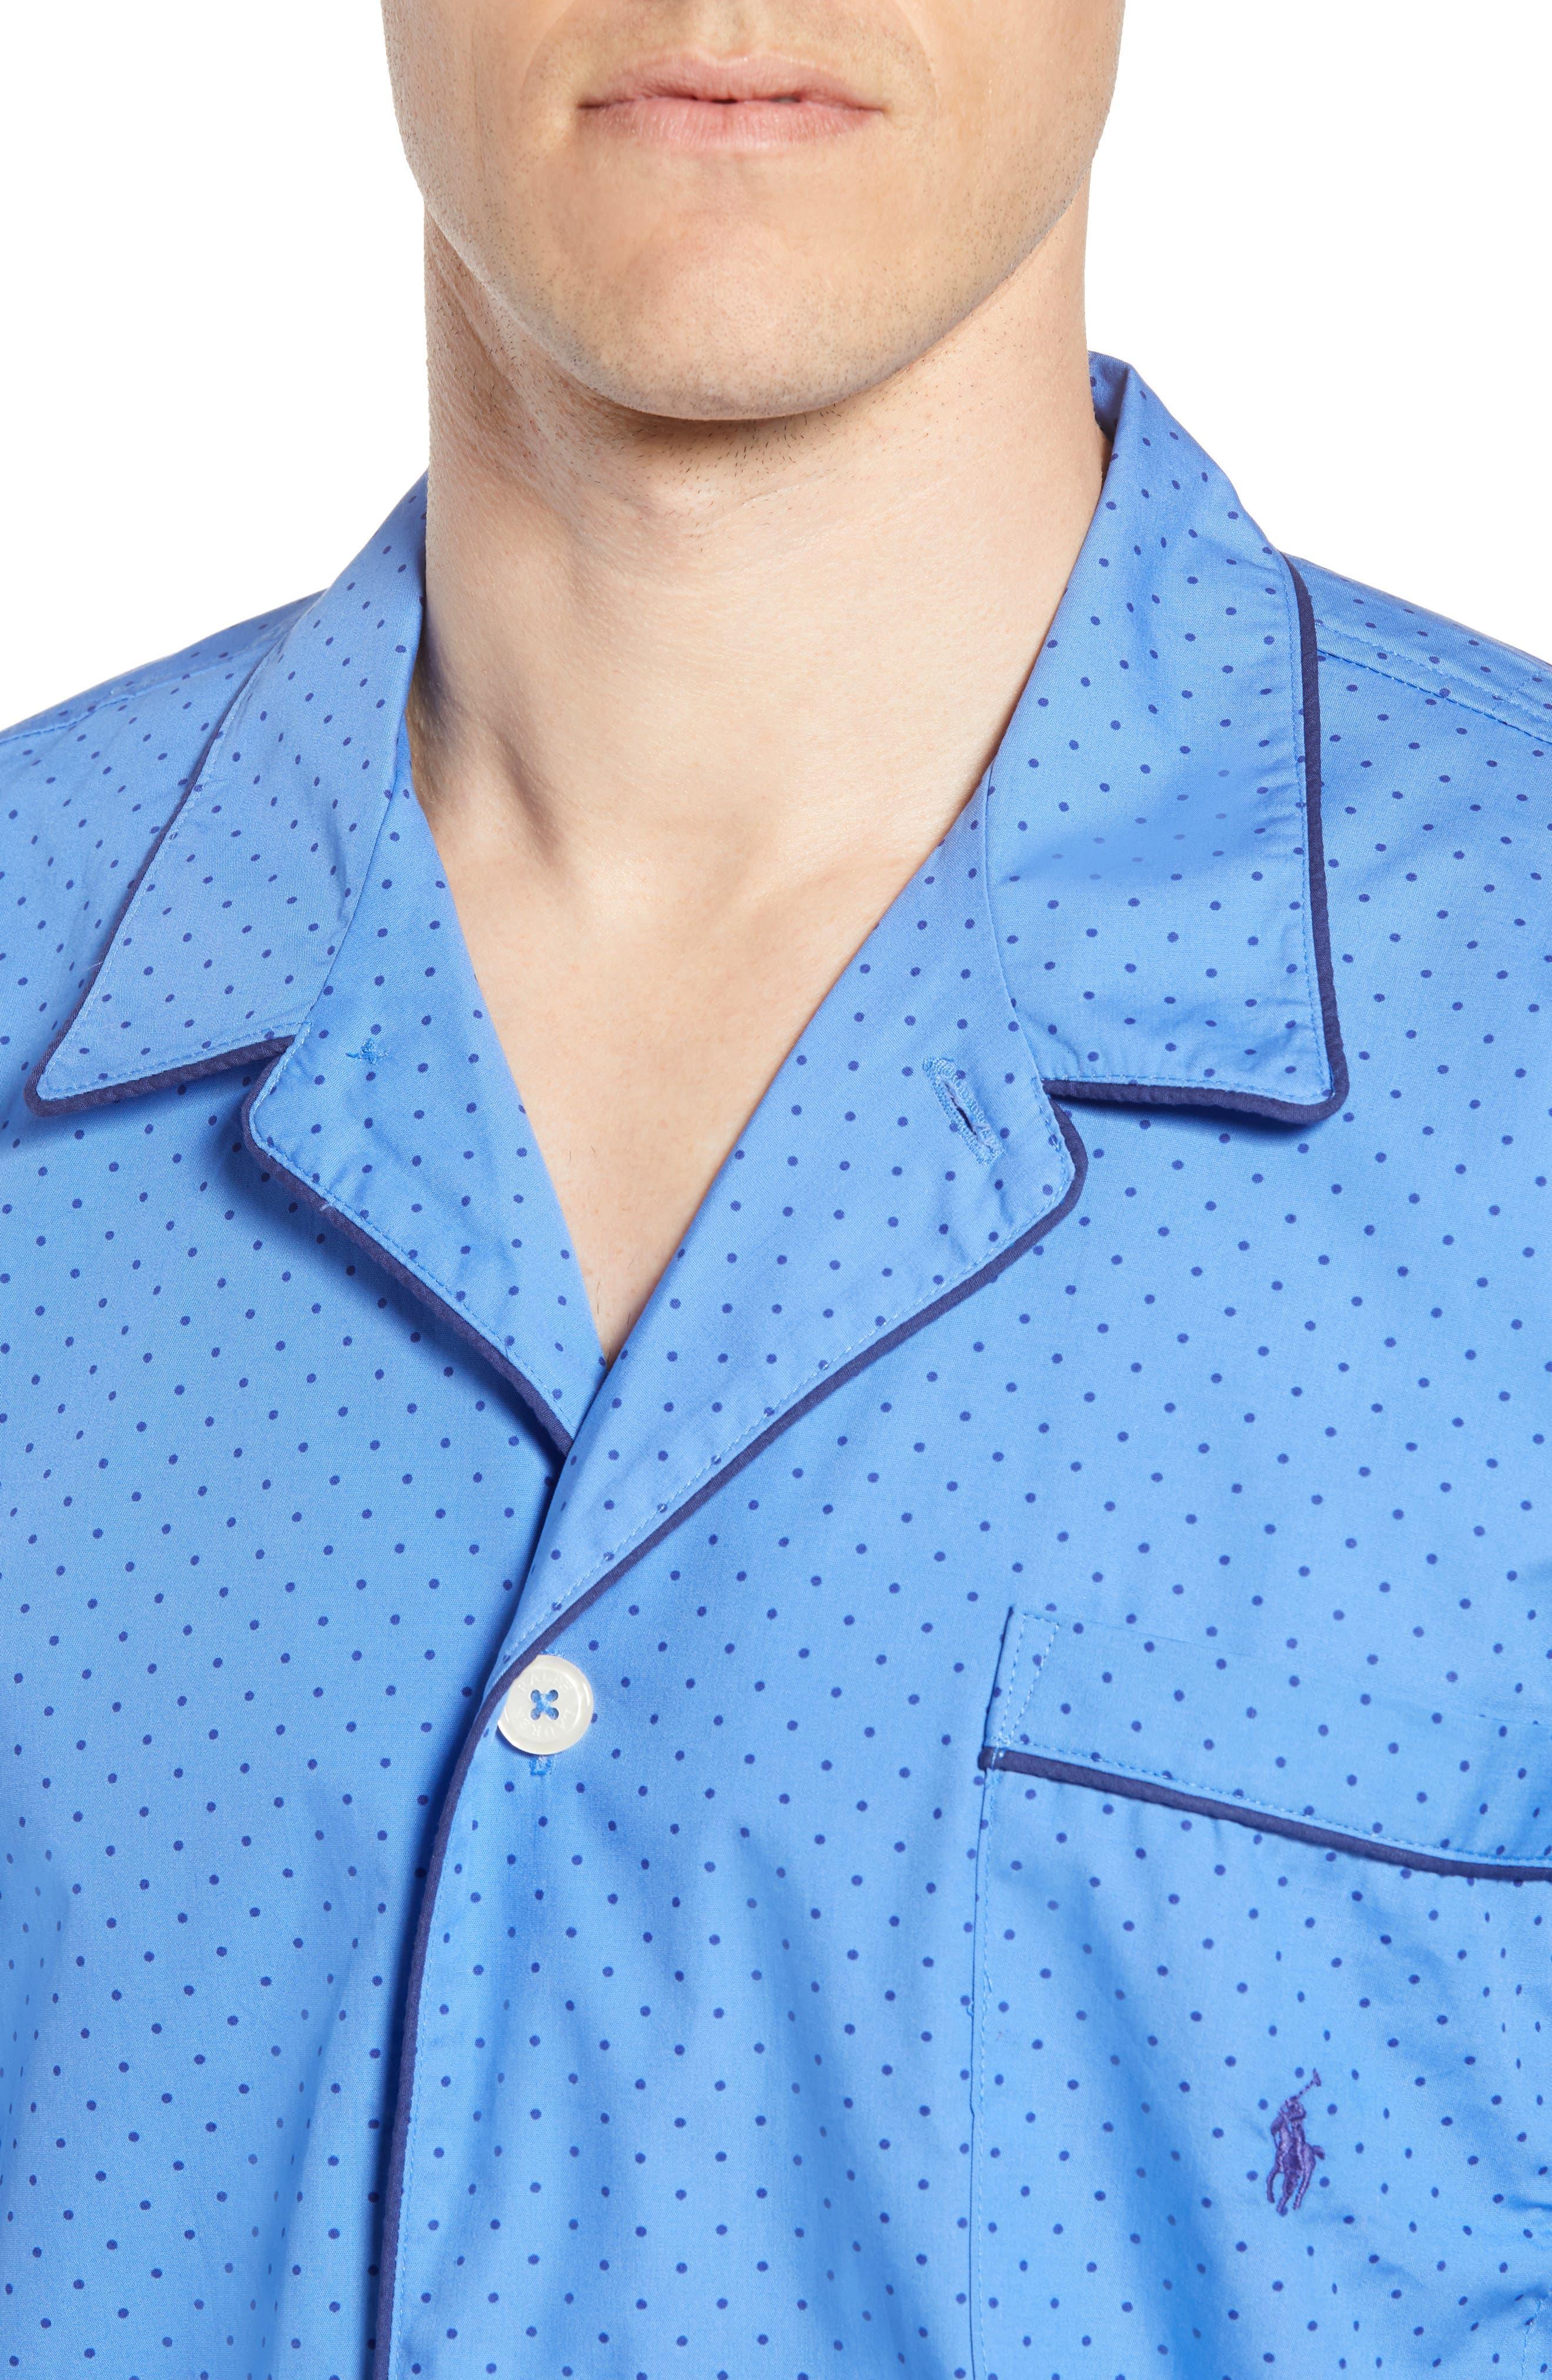 POLO RALPH LAUREN,                             Dot Cotton Pajama Shirt,                             Alternate thumbnail 4, color,                             451